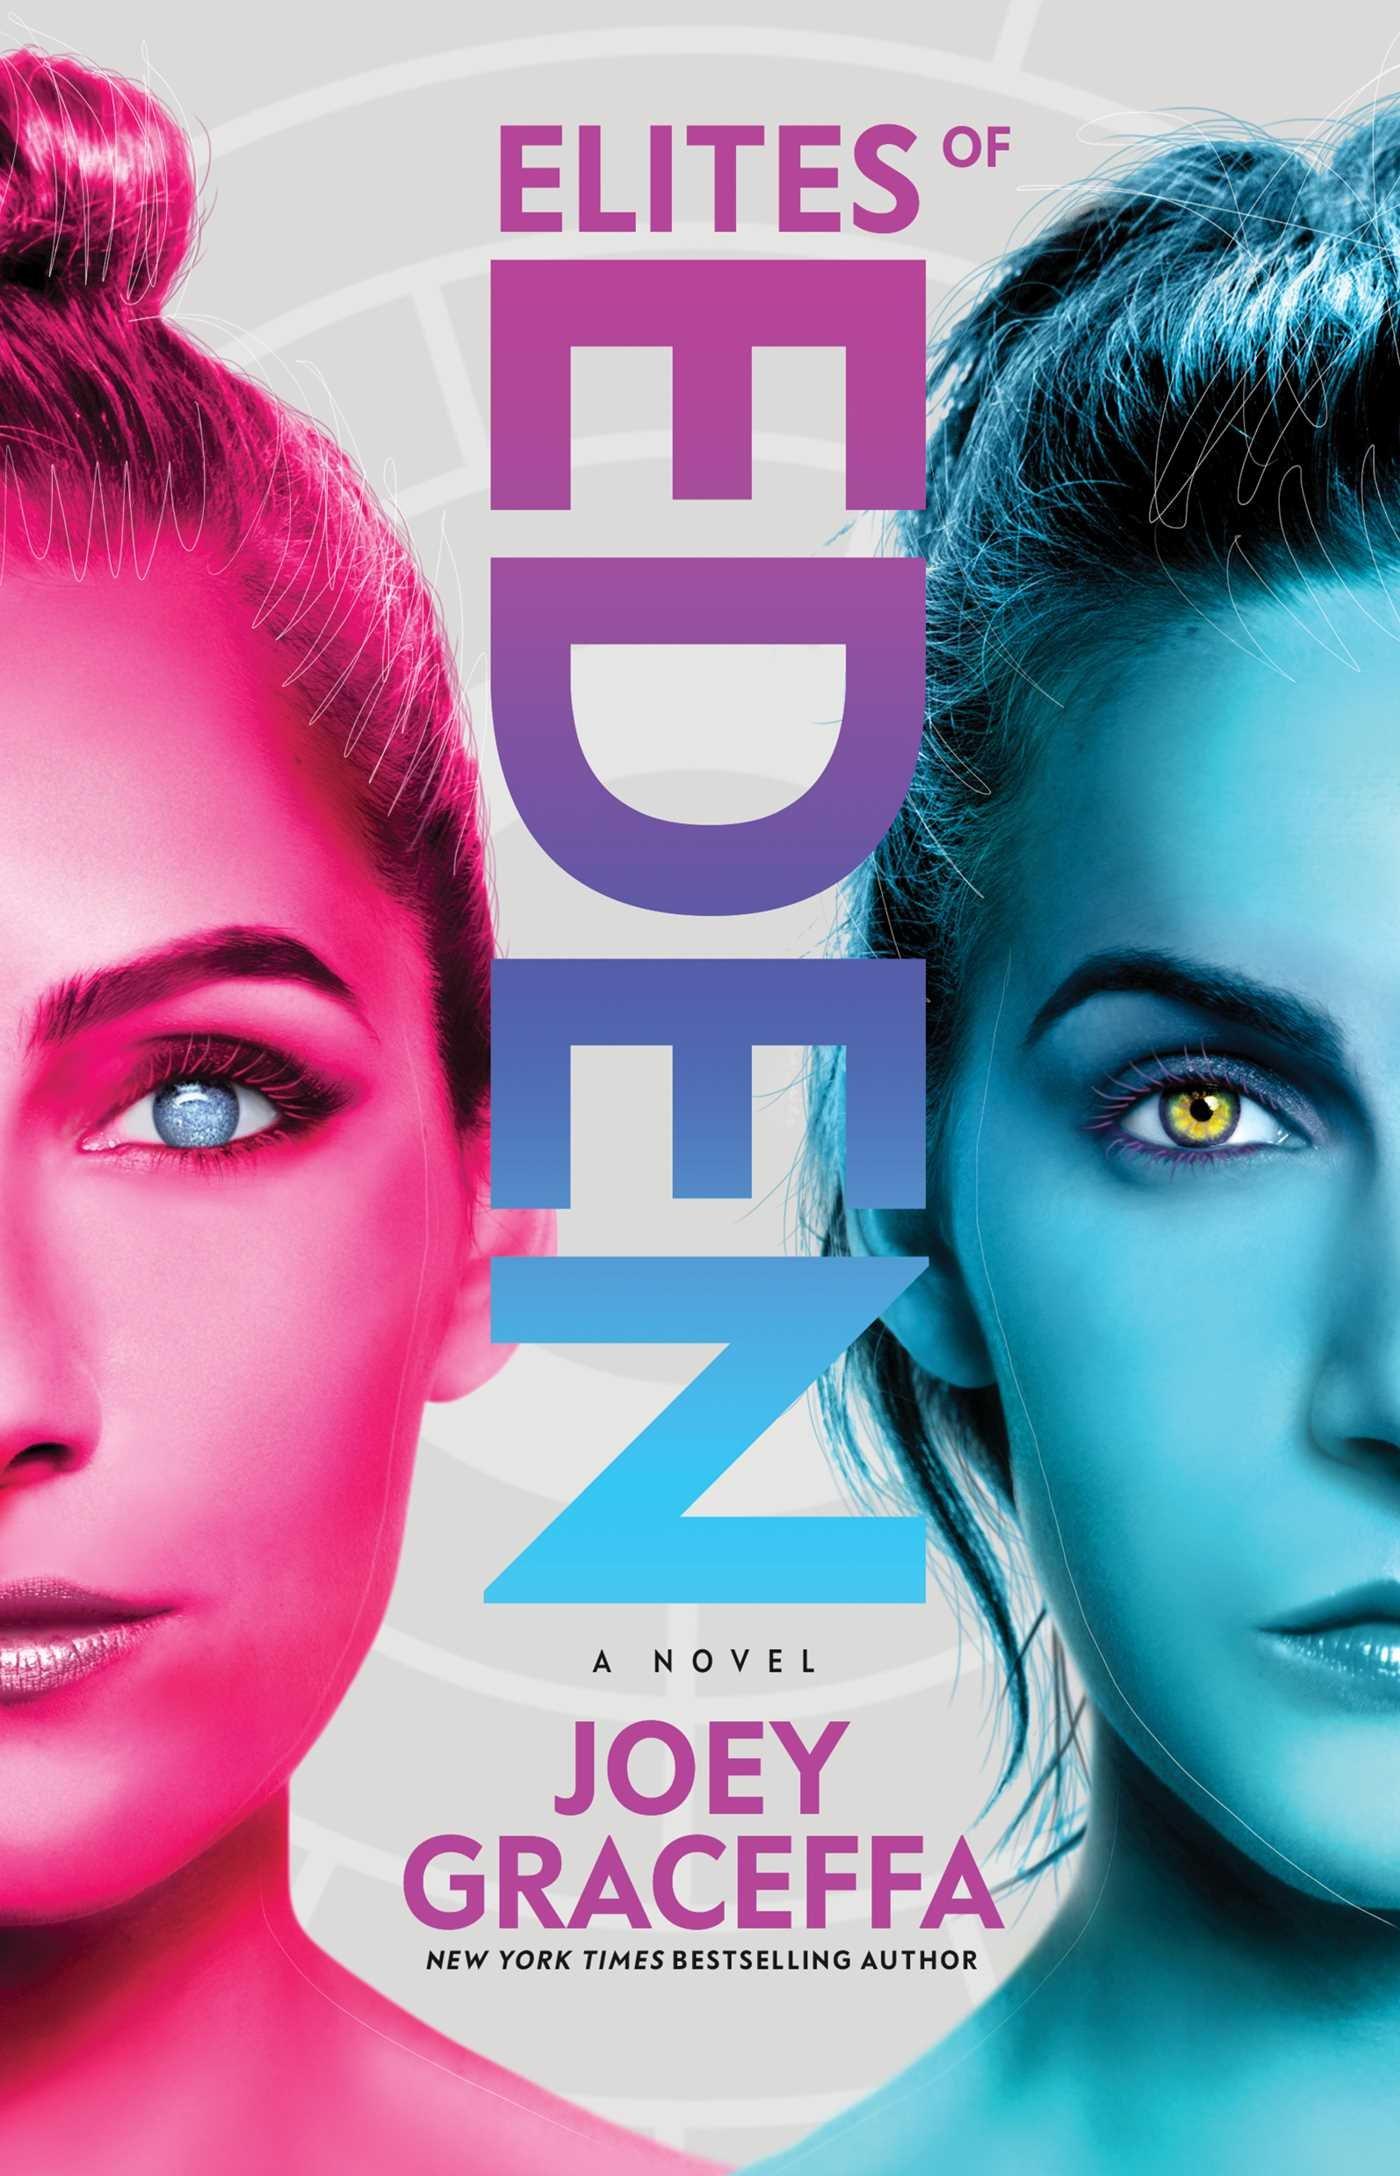 Amazon.com: Elites of Eden: A Novel (Children of Eden) (9781501174537):  Joey Graceffa: Books